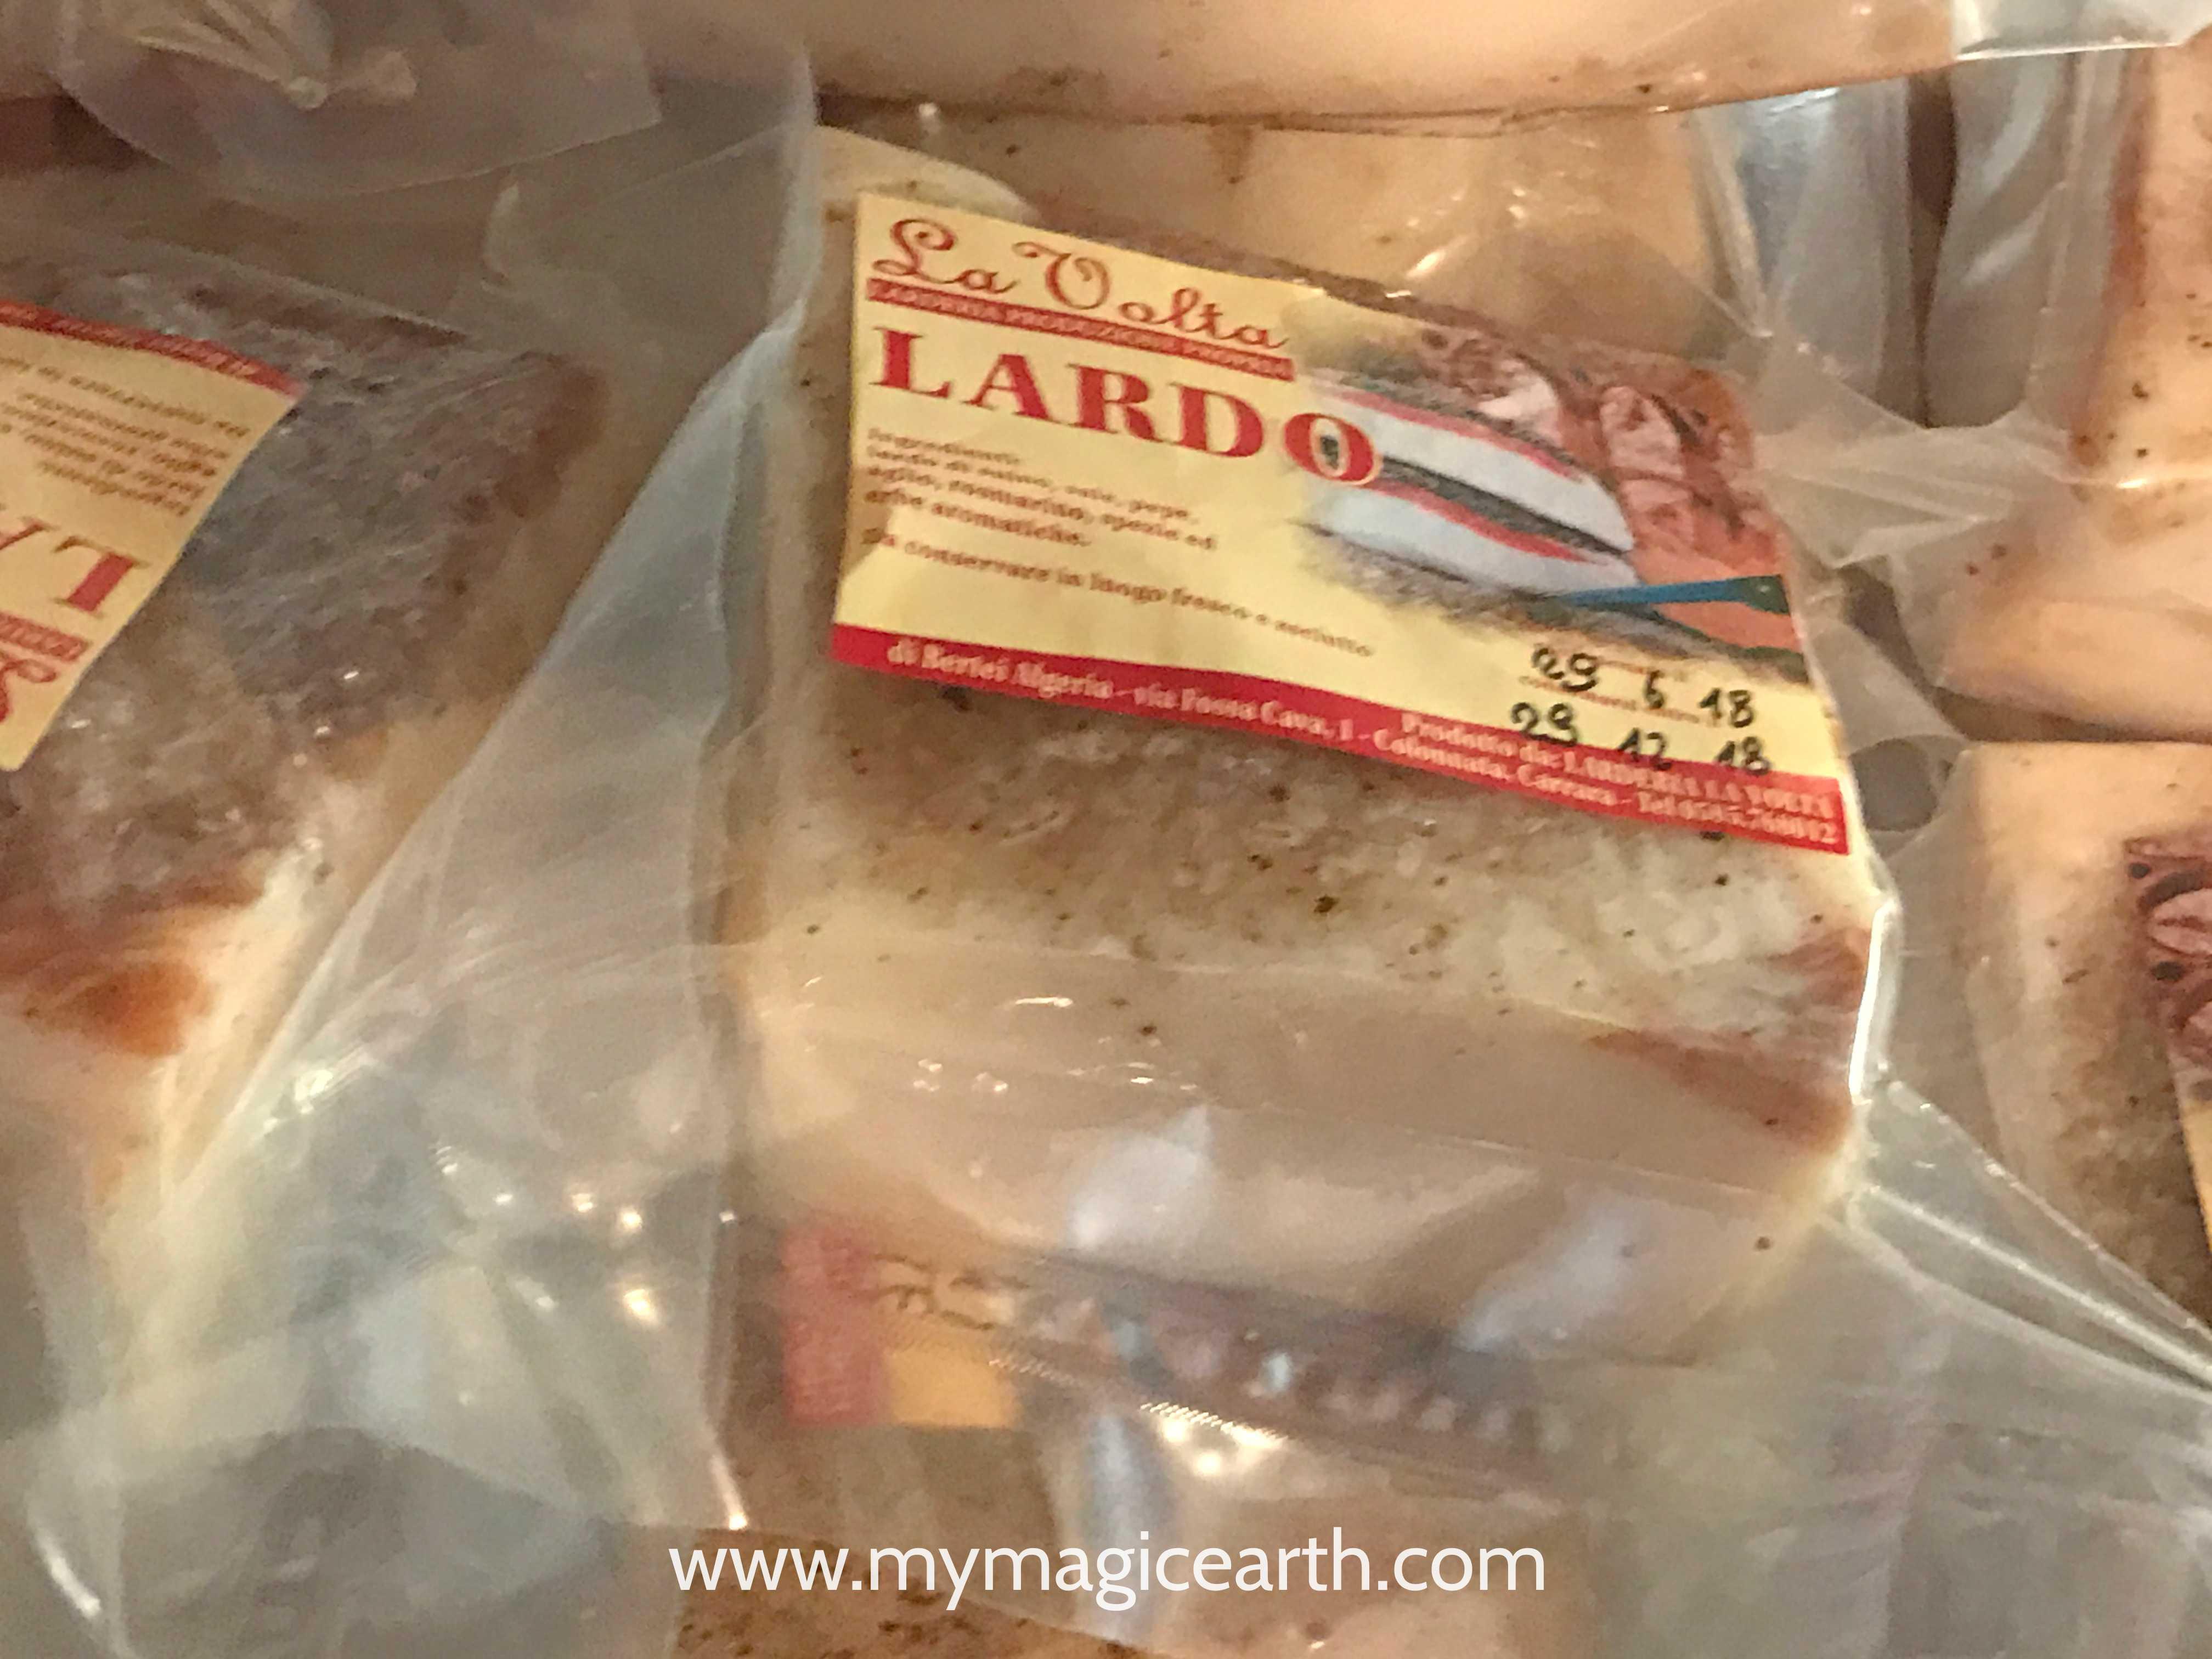 Colonnata lard sold in the local surpermarket, Colonnata innorthern Tuscany